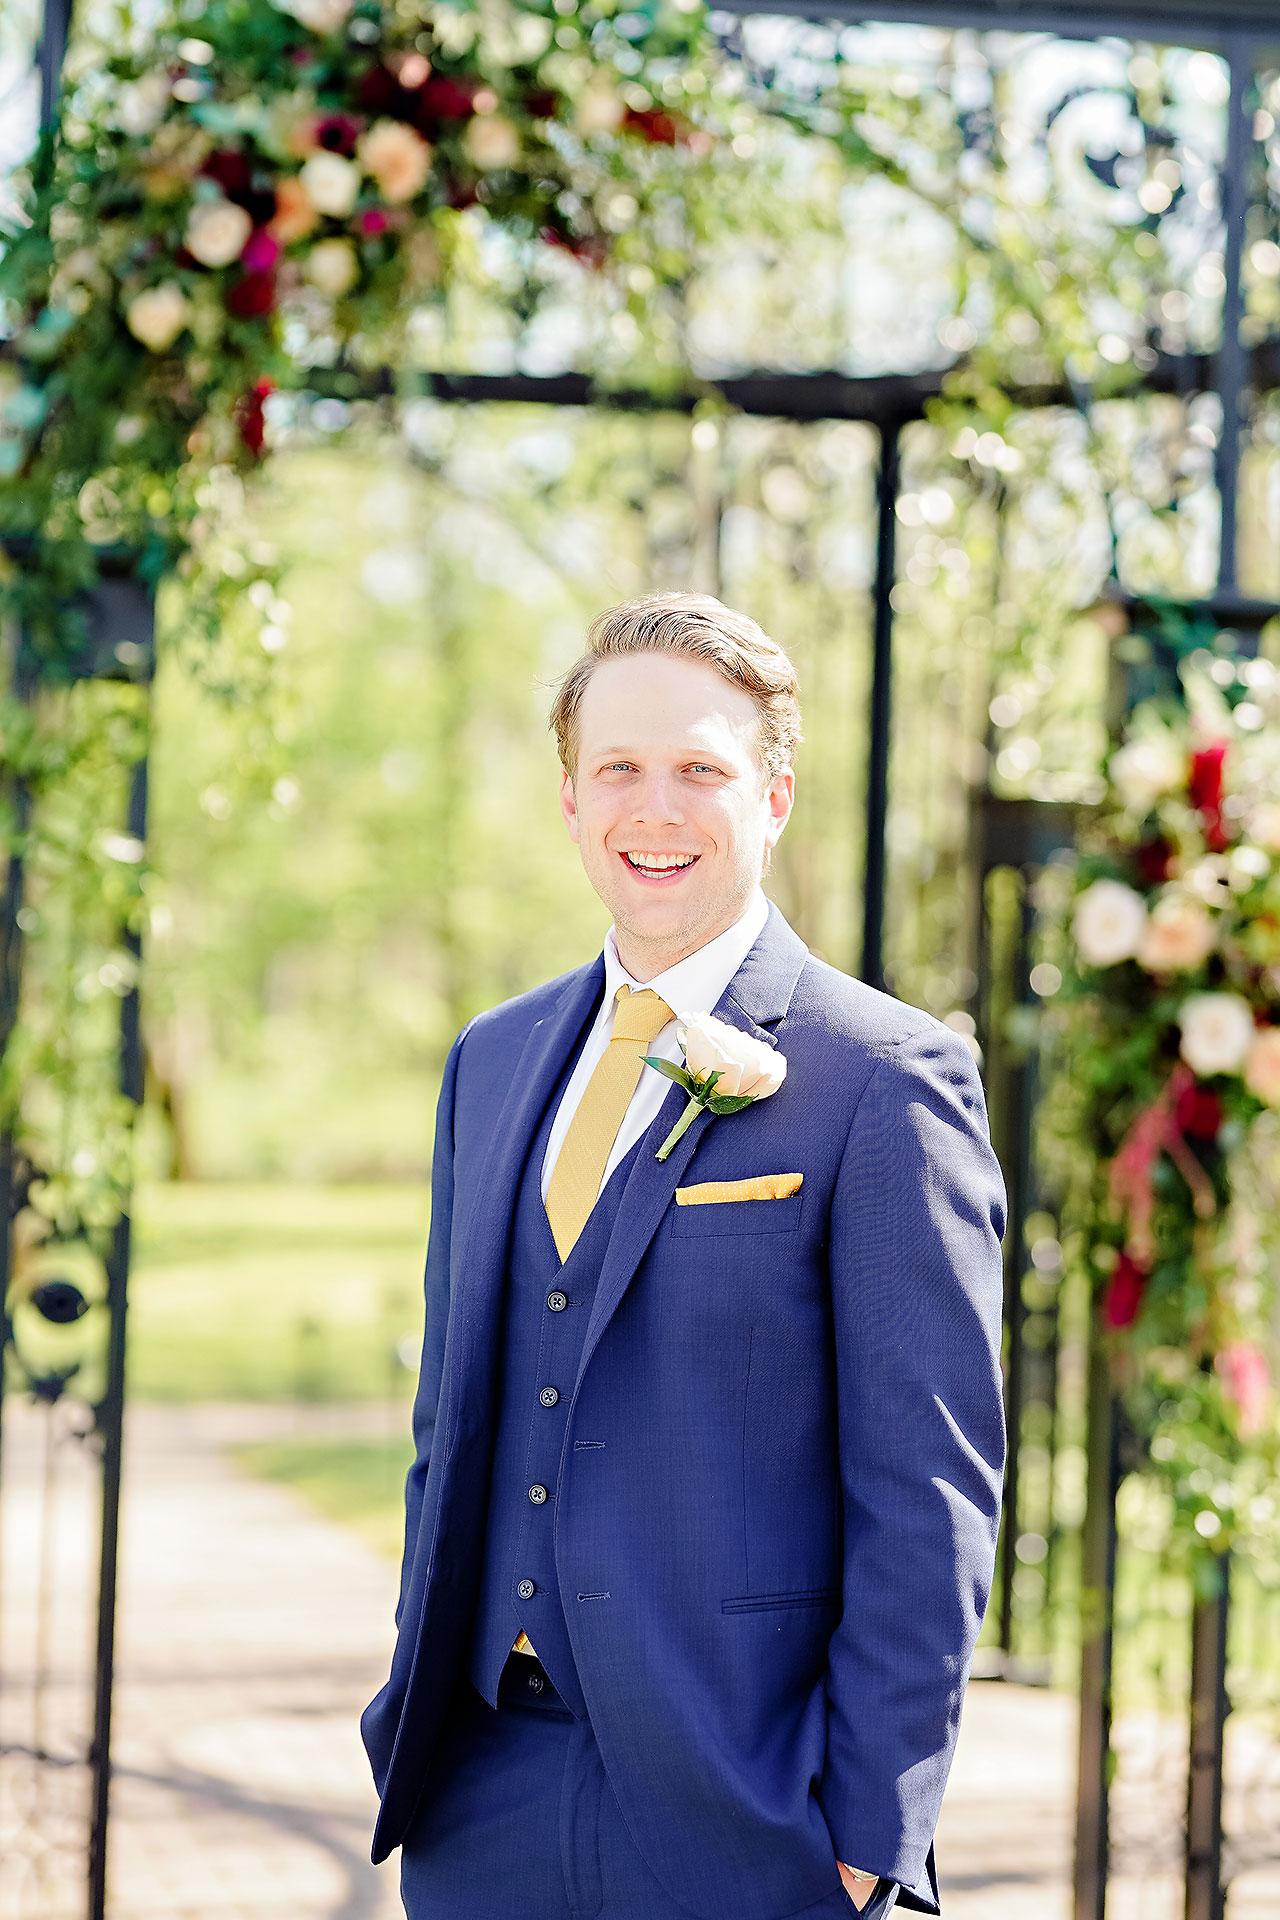 Nadia Parker Black Iris Estate Carmel Indiana Wedding May 2021 087